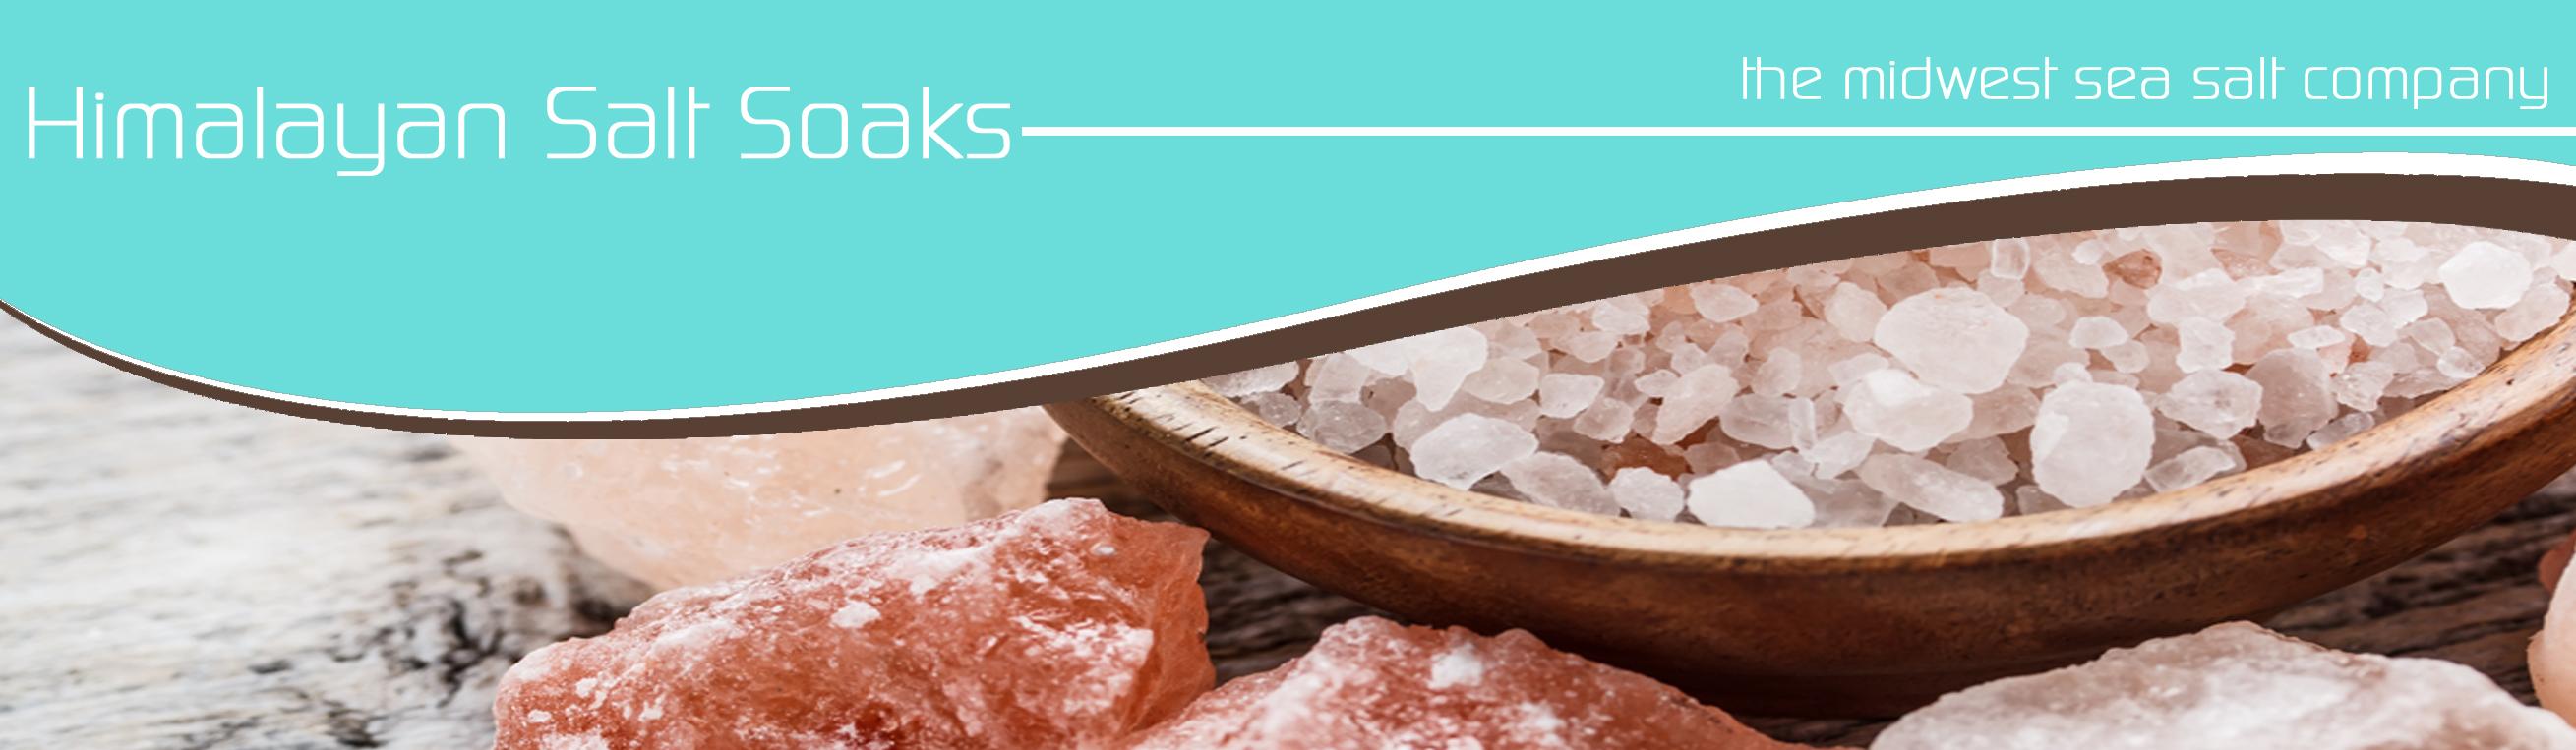 himalayan-salt-soaks-midwest-sea-salt.jpg